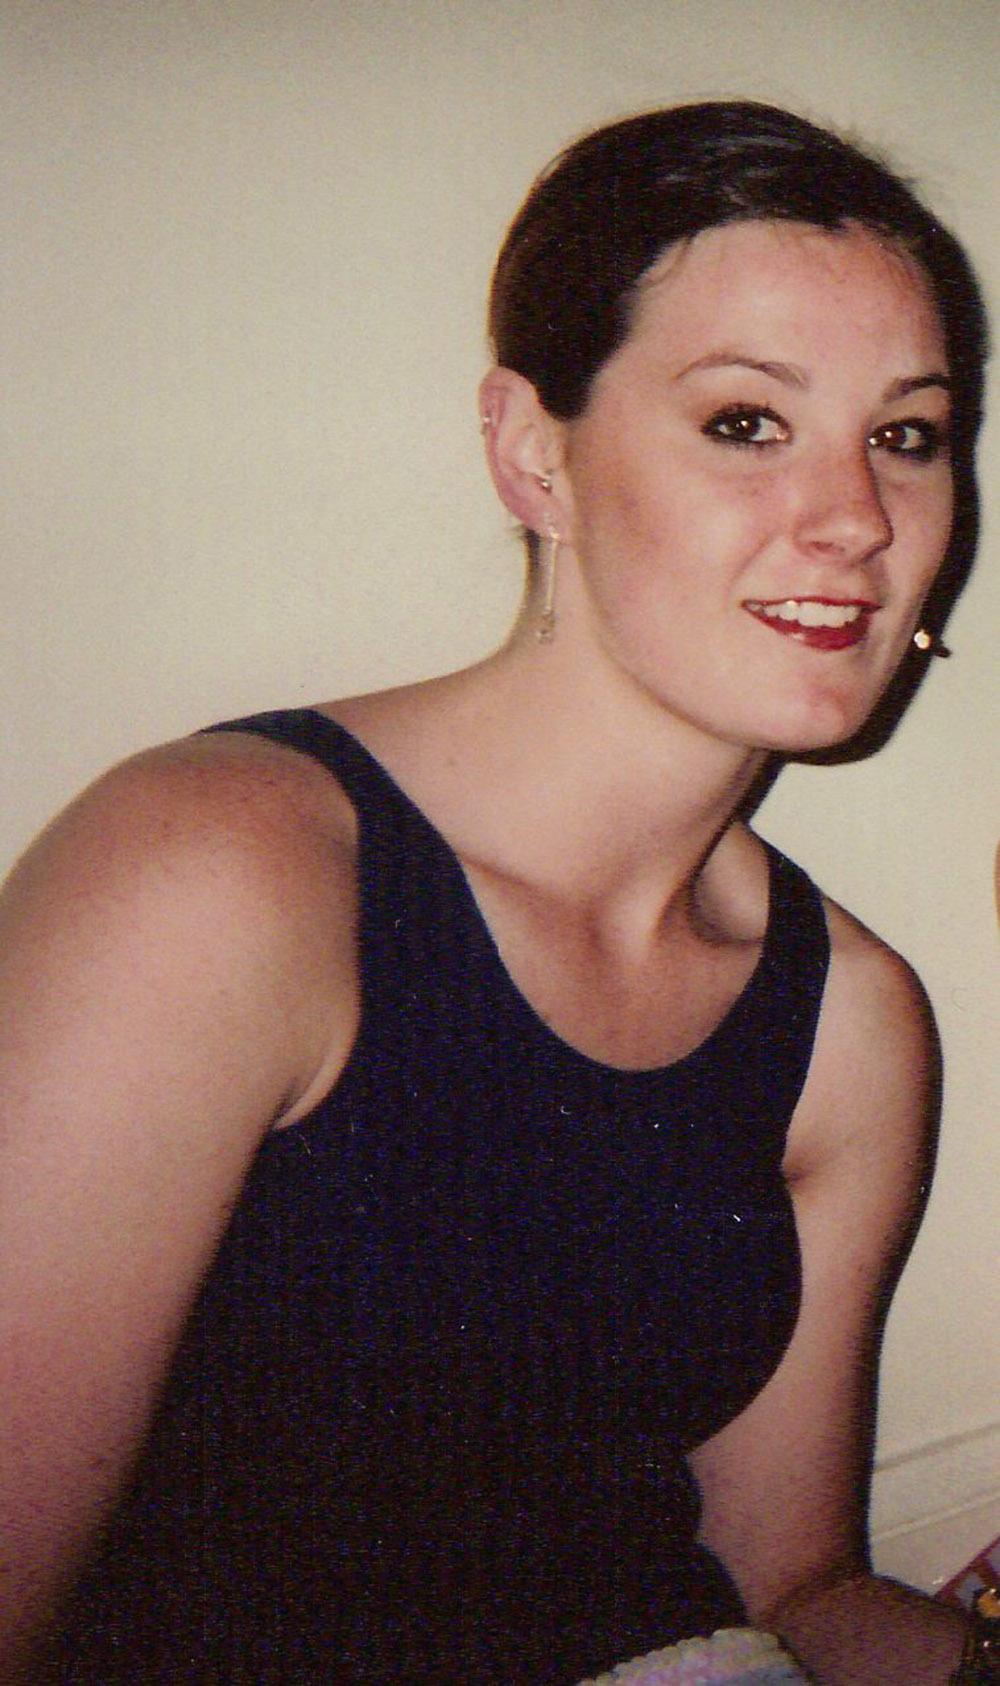 Nat as a Dancer, Age 17